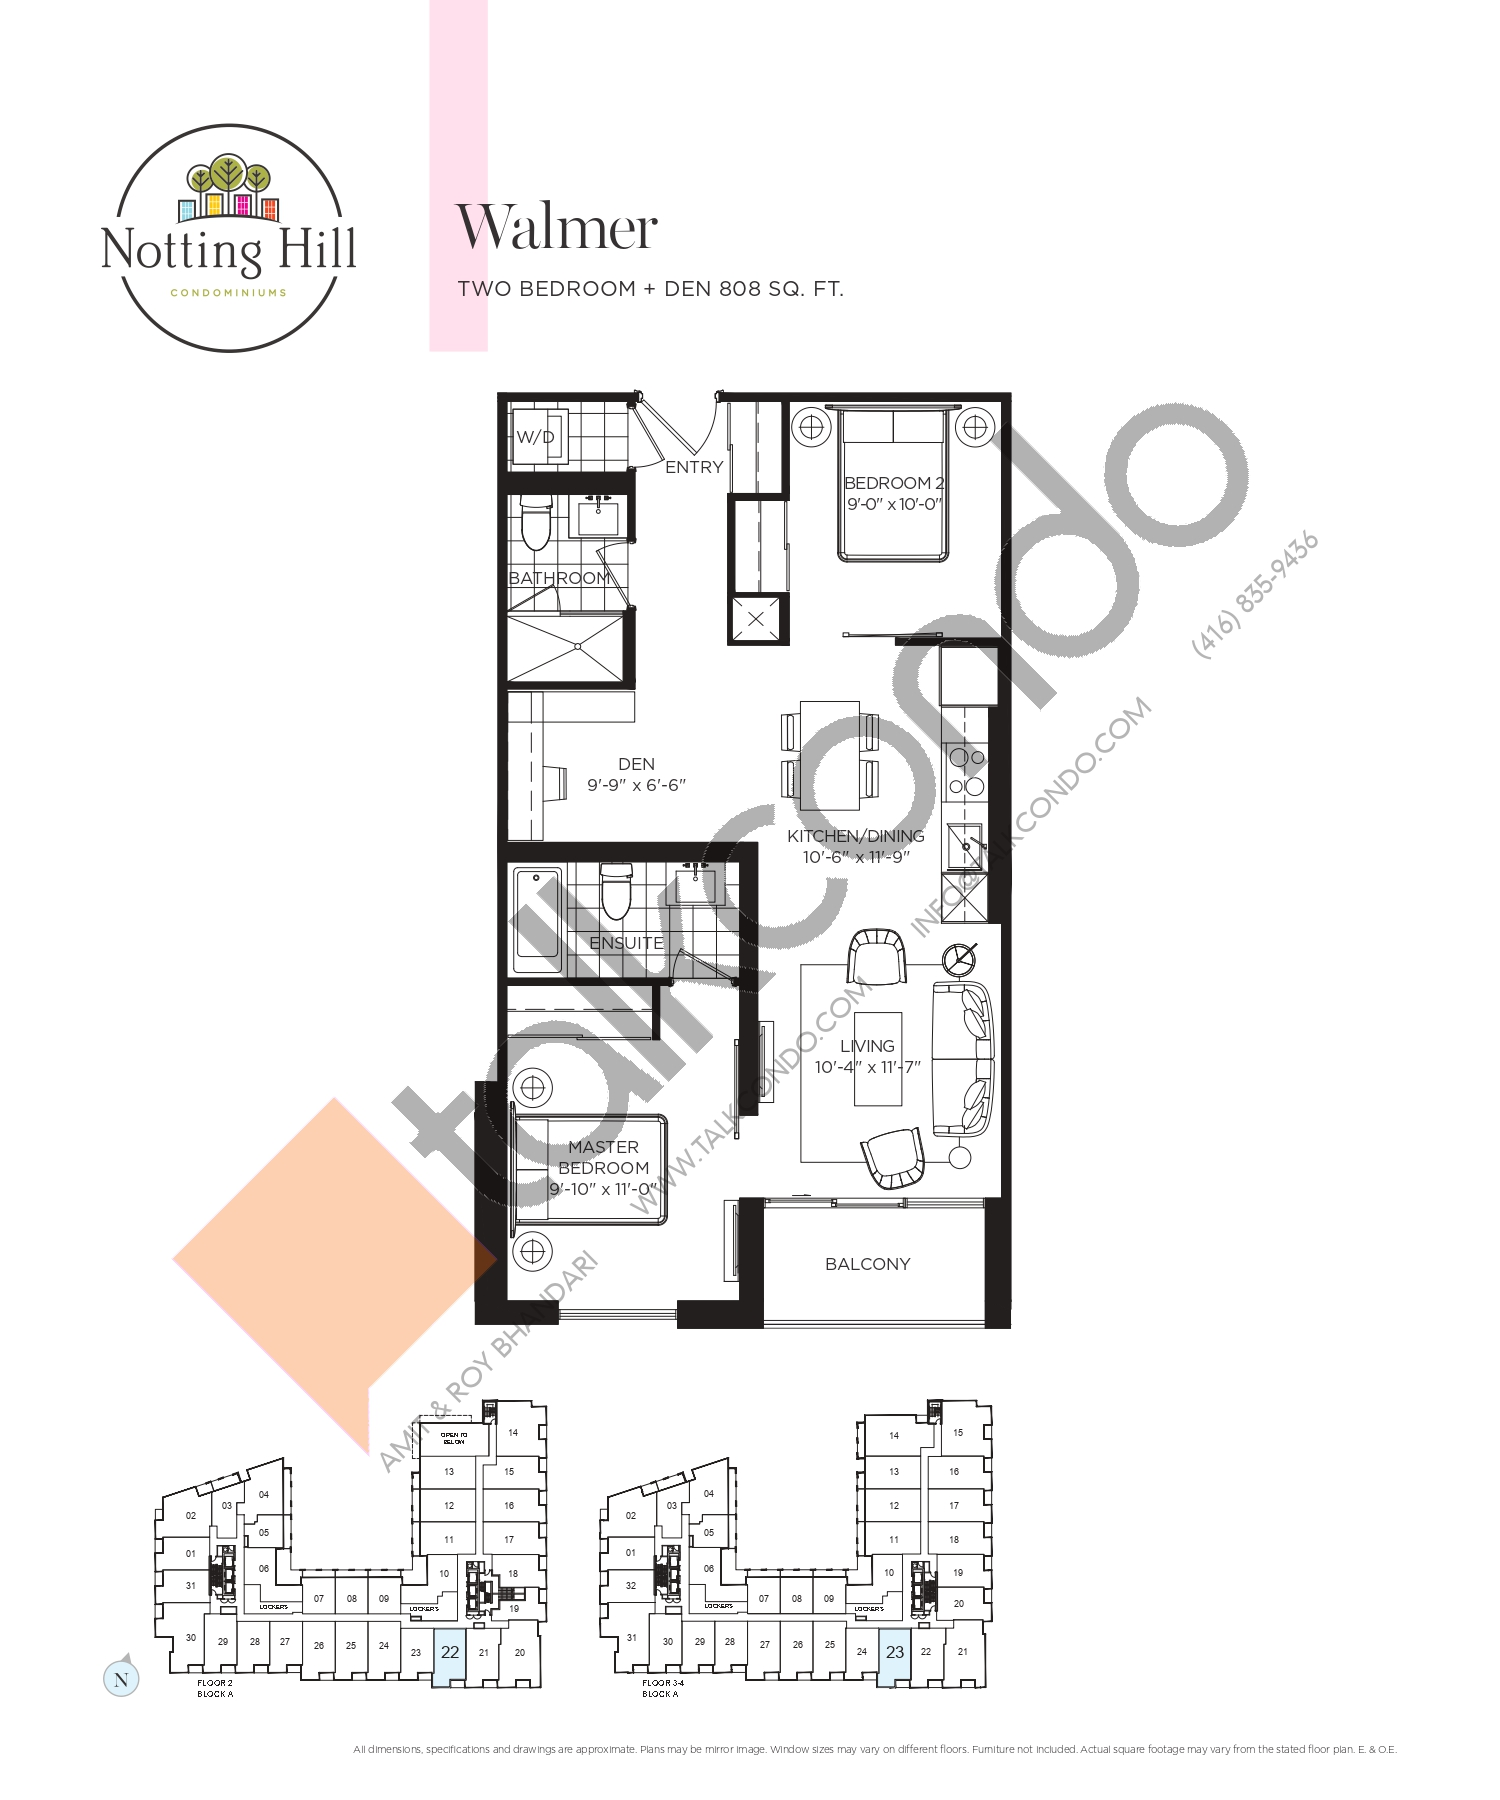 Walmer Floor Plan at Notting Hill Phase 2 Condos - 808 sq.ft